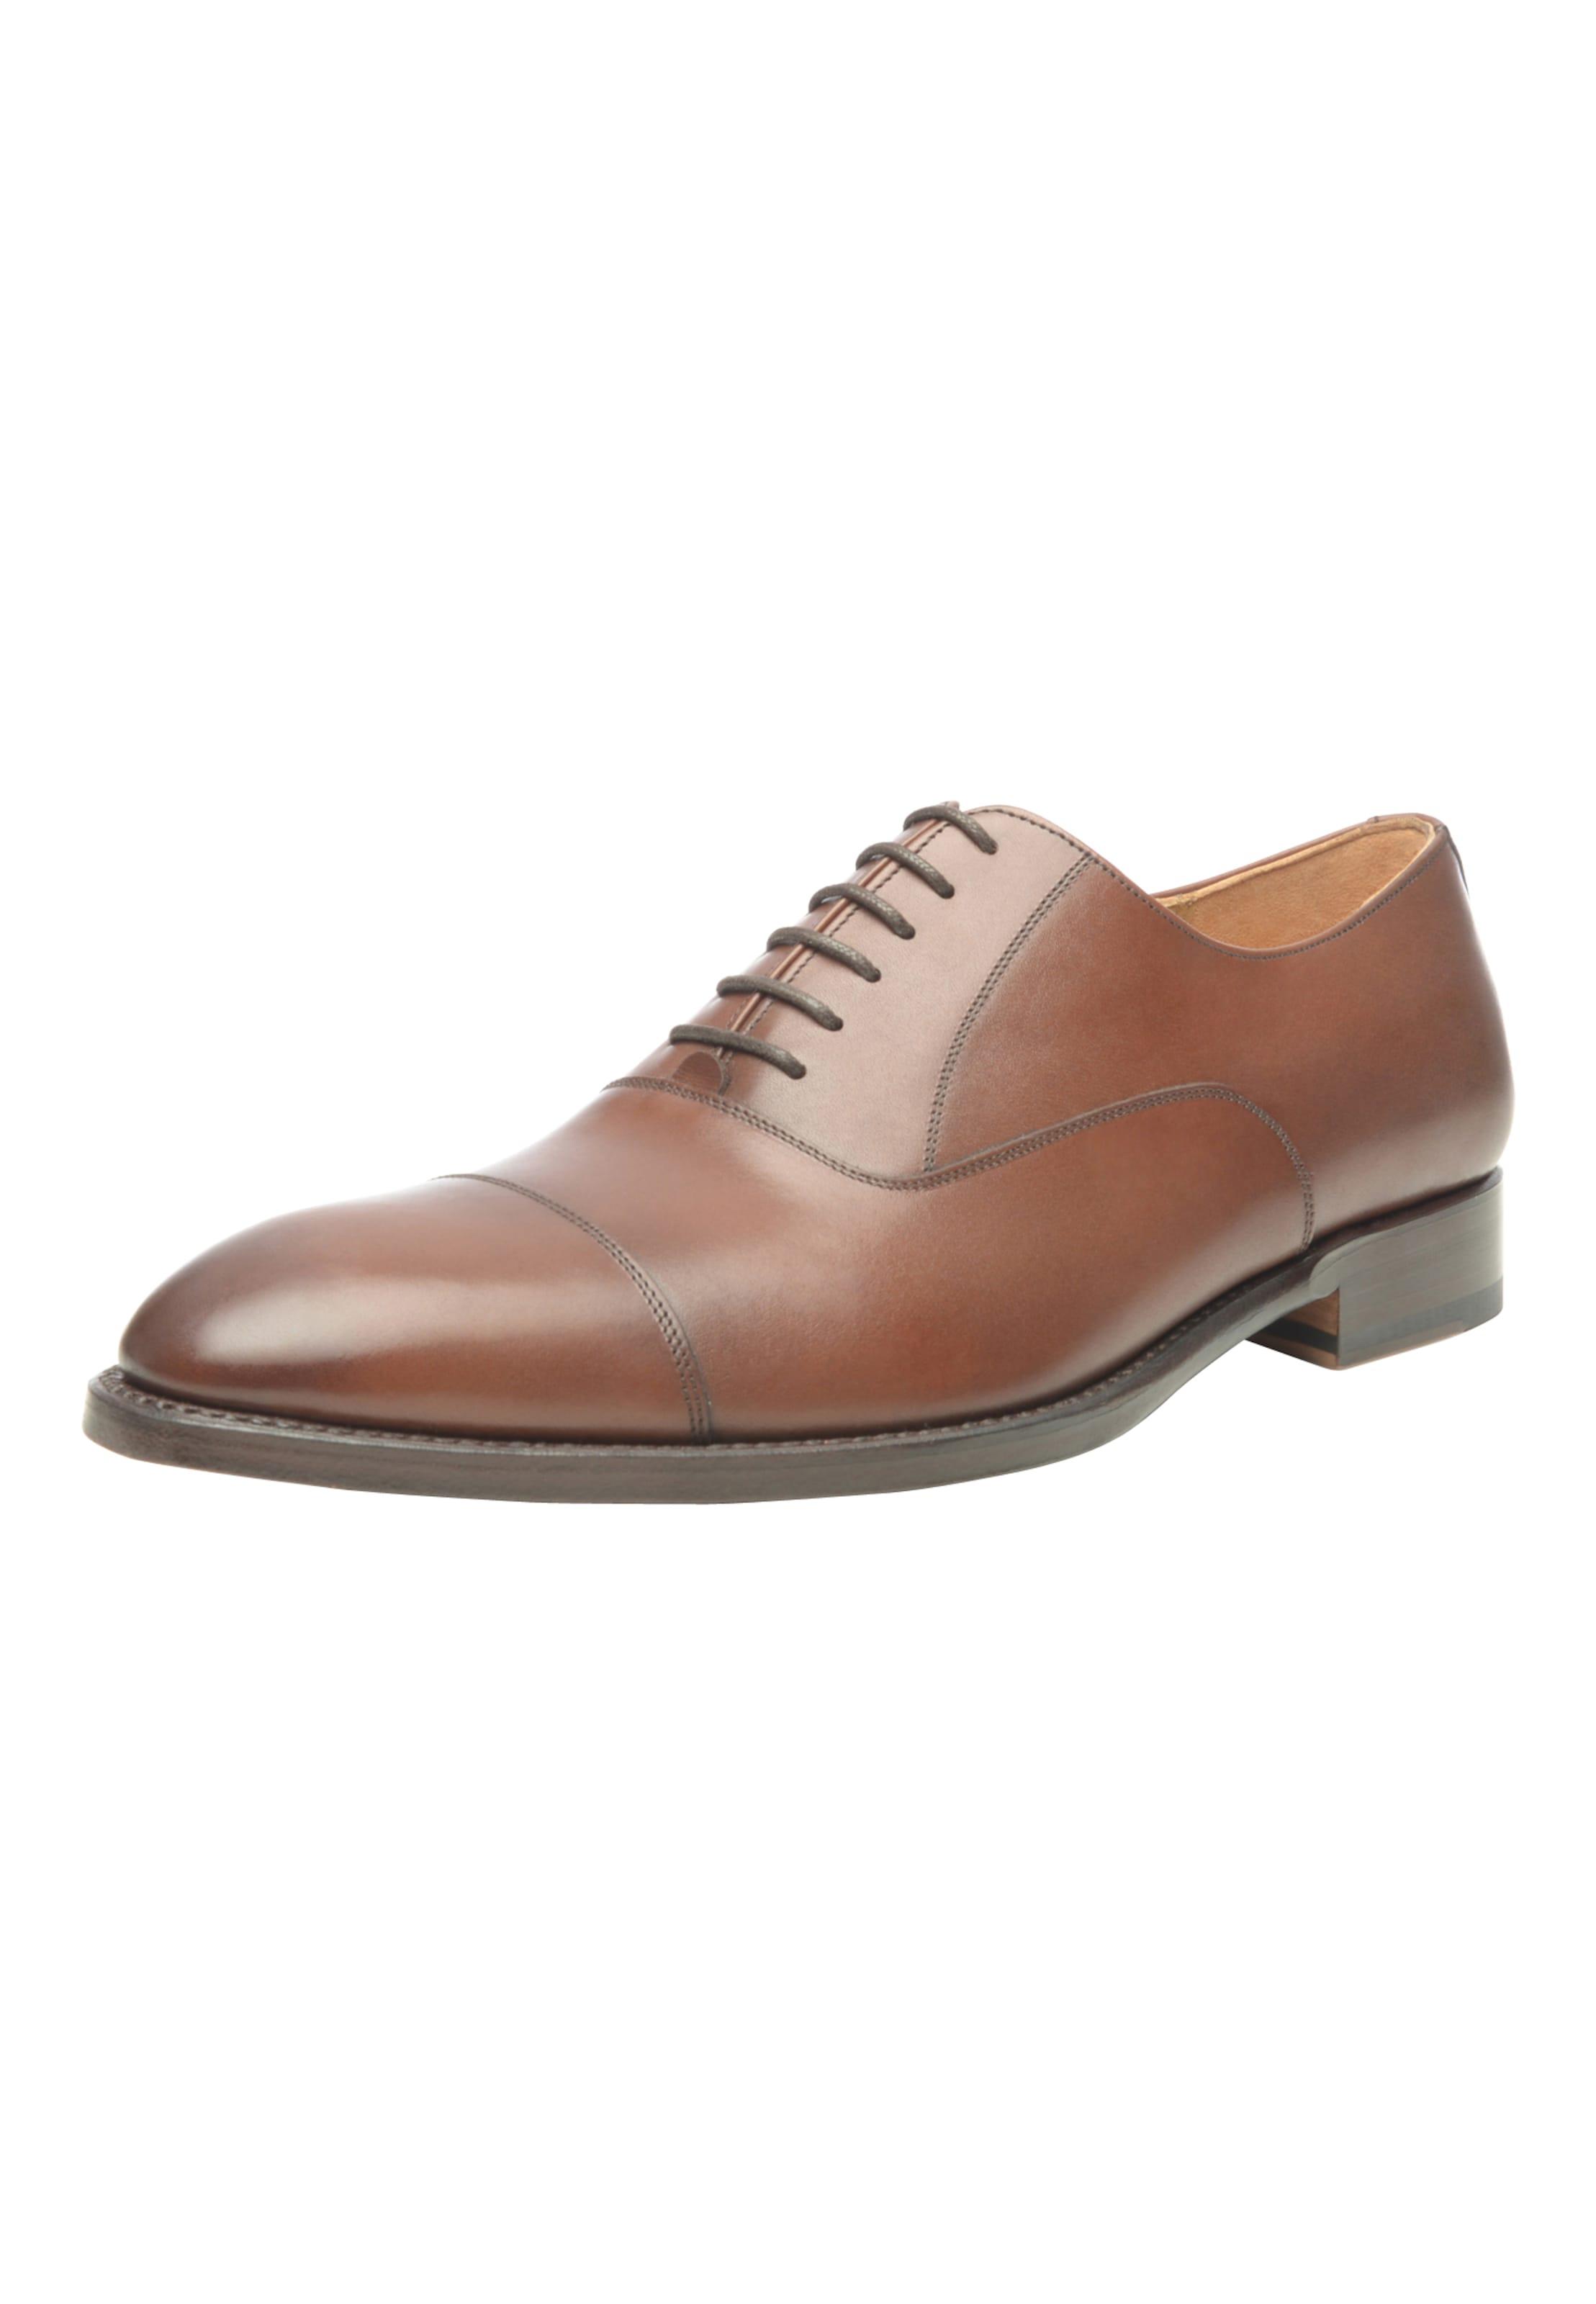 Haltbare Mode billige Schuhe SHOEPASSION   Businessschuhe 'No. 574' Schuhe Gut getragene Schuhe